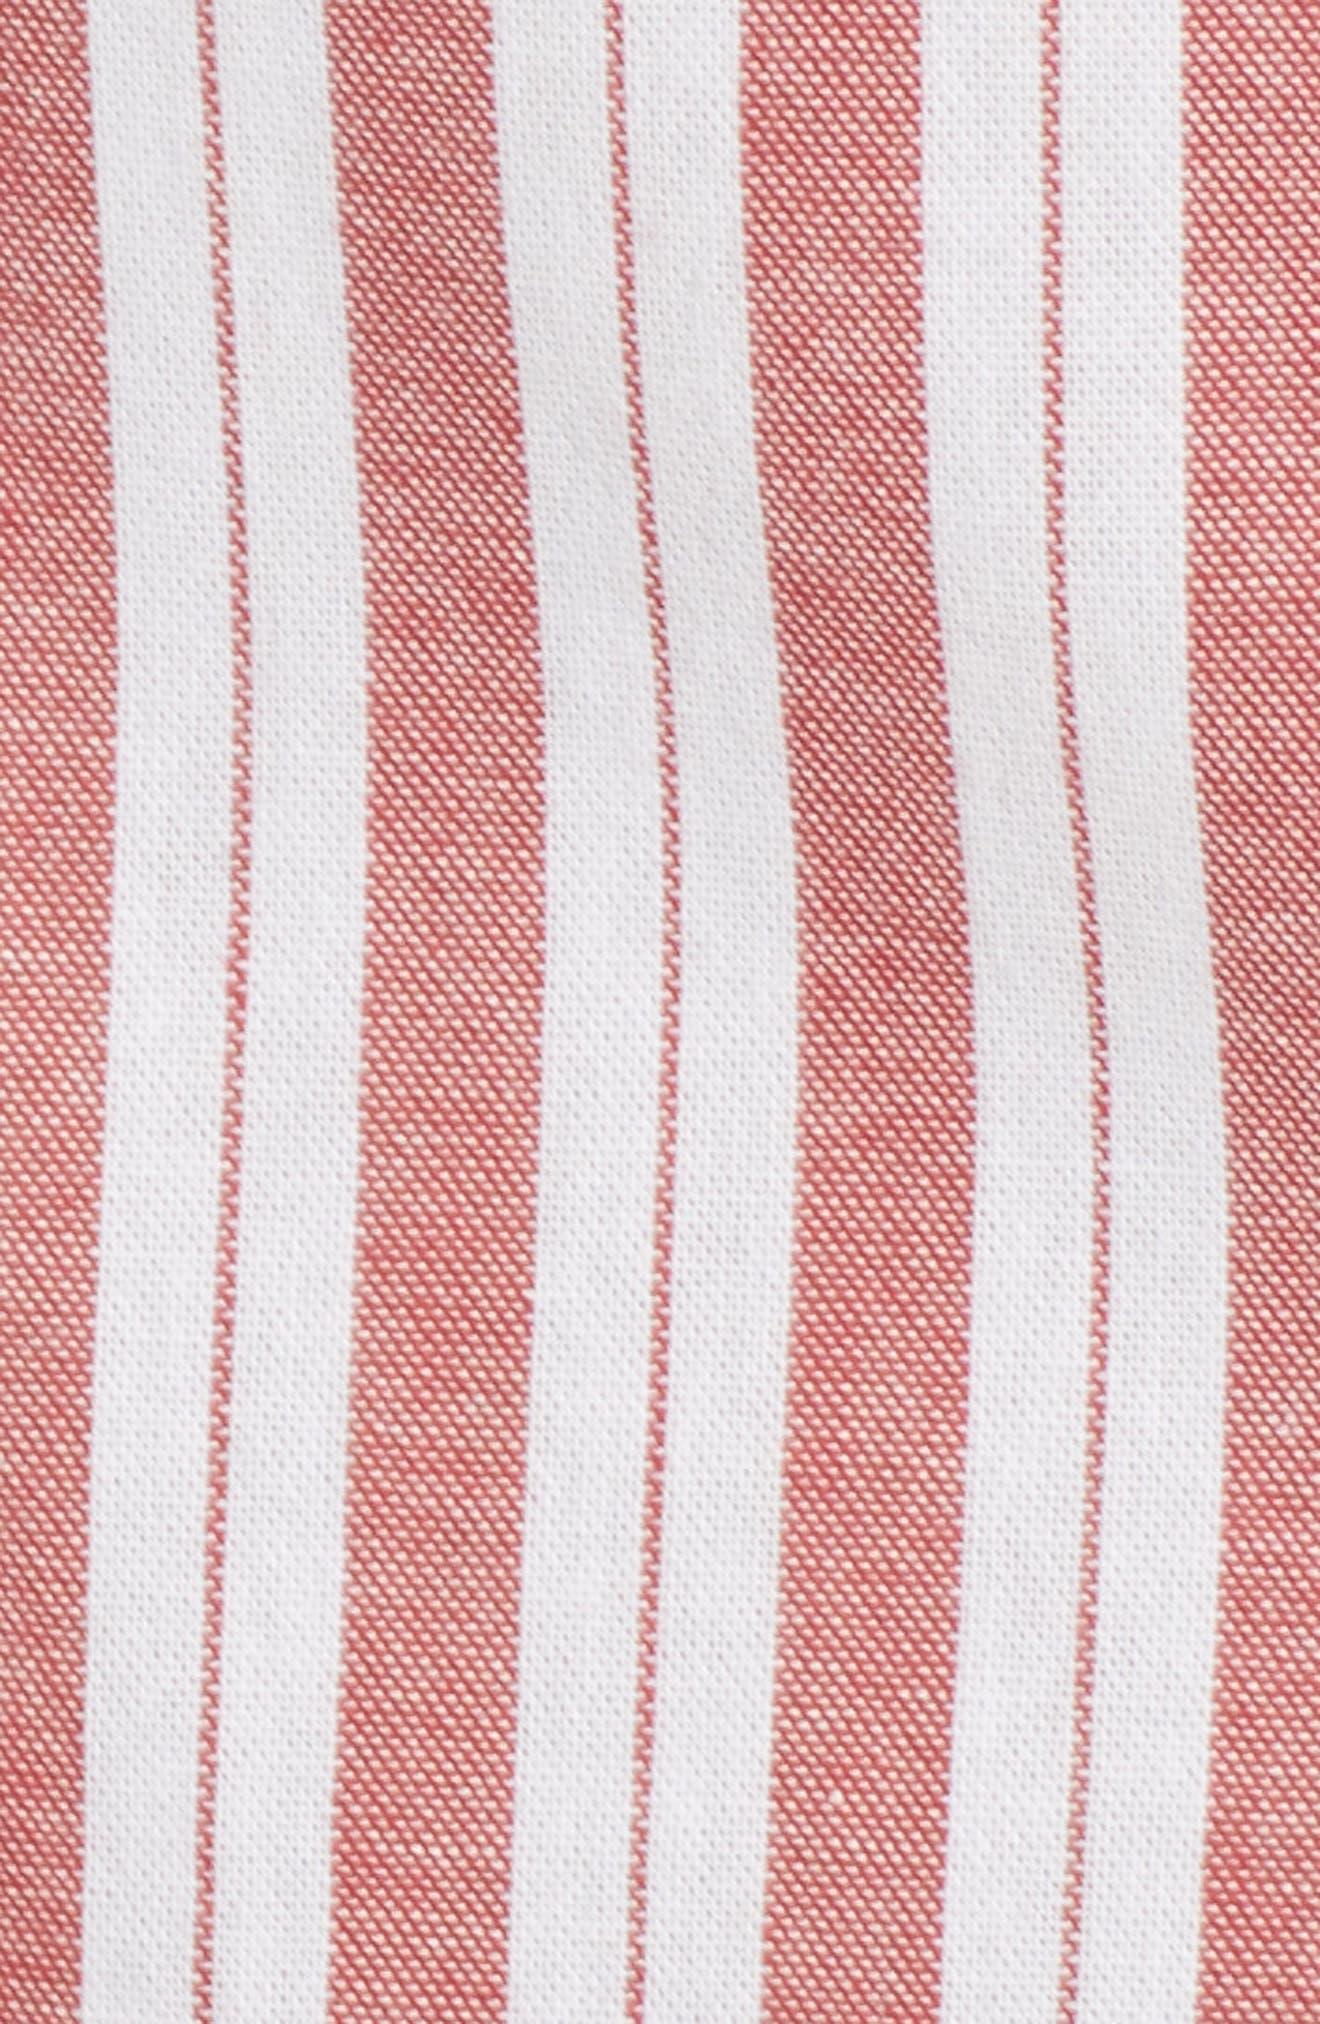 Acacia Stripe Ruffle Dress,                             Alternate thumbnail 6, color,                             600